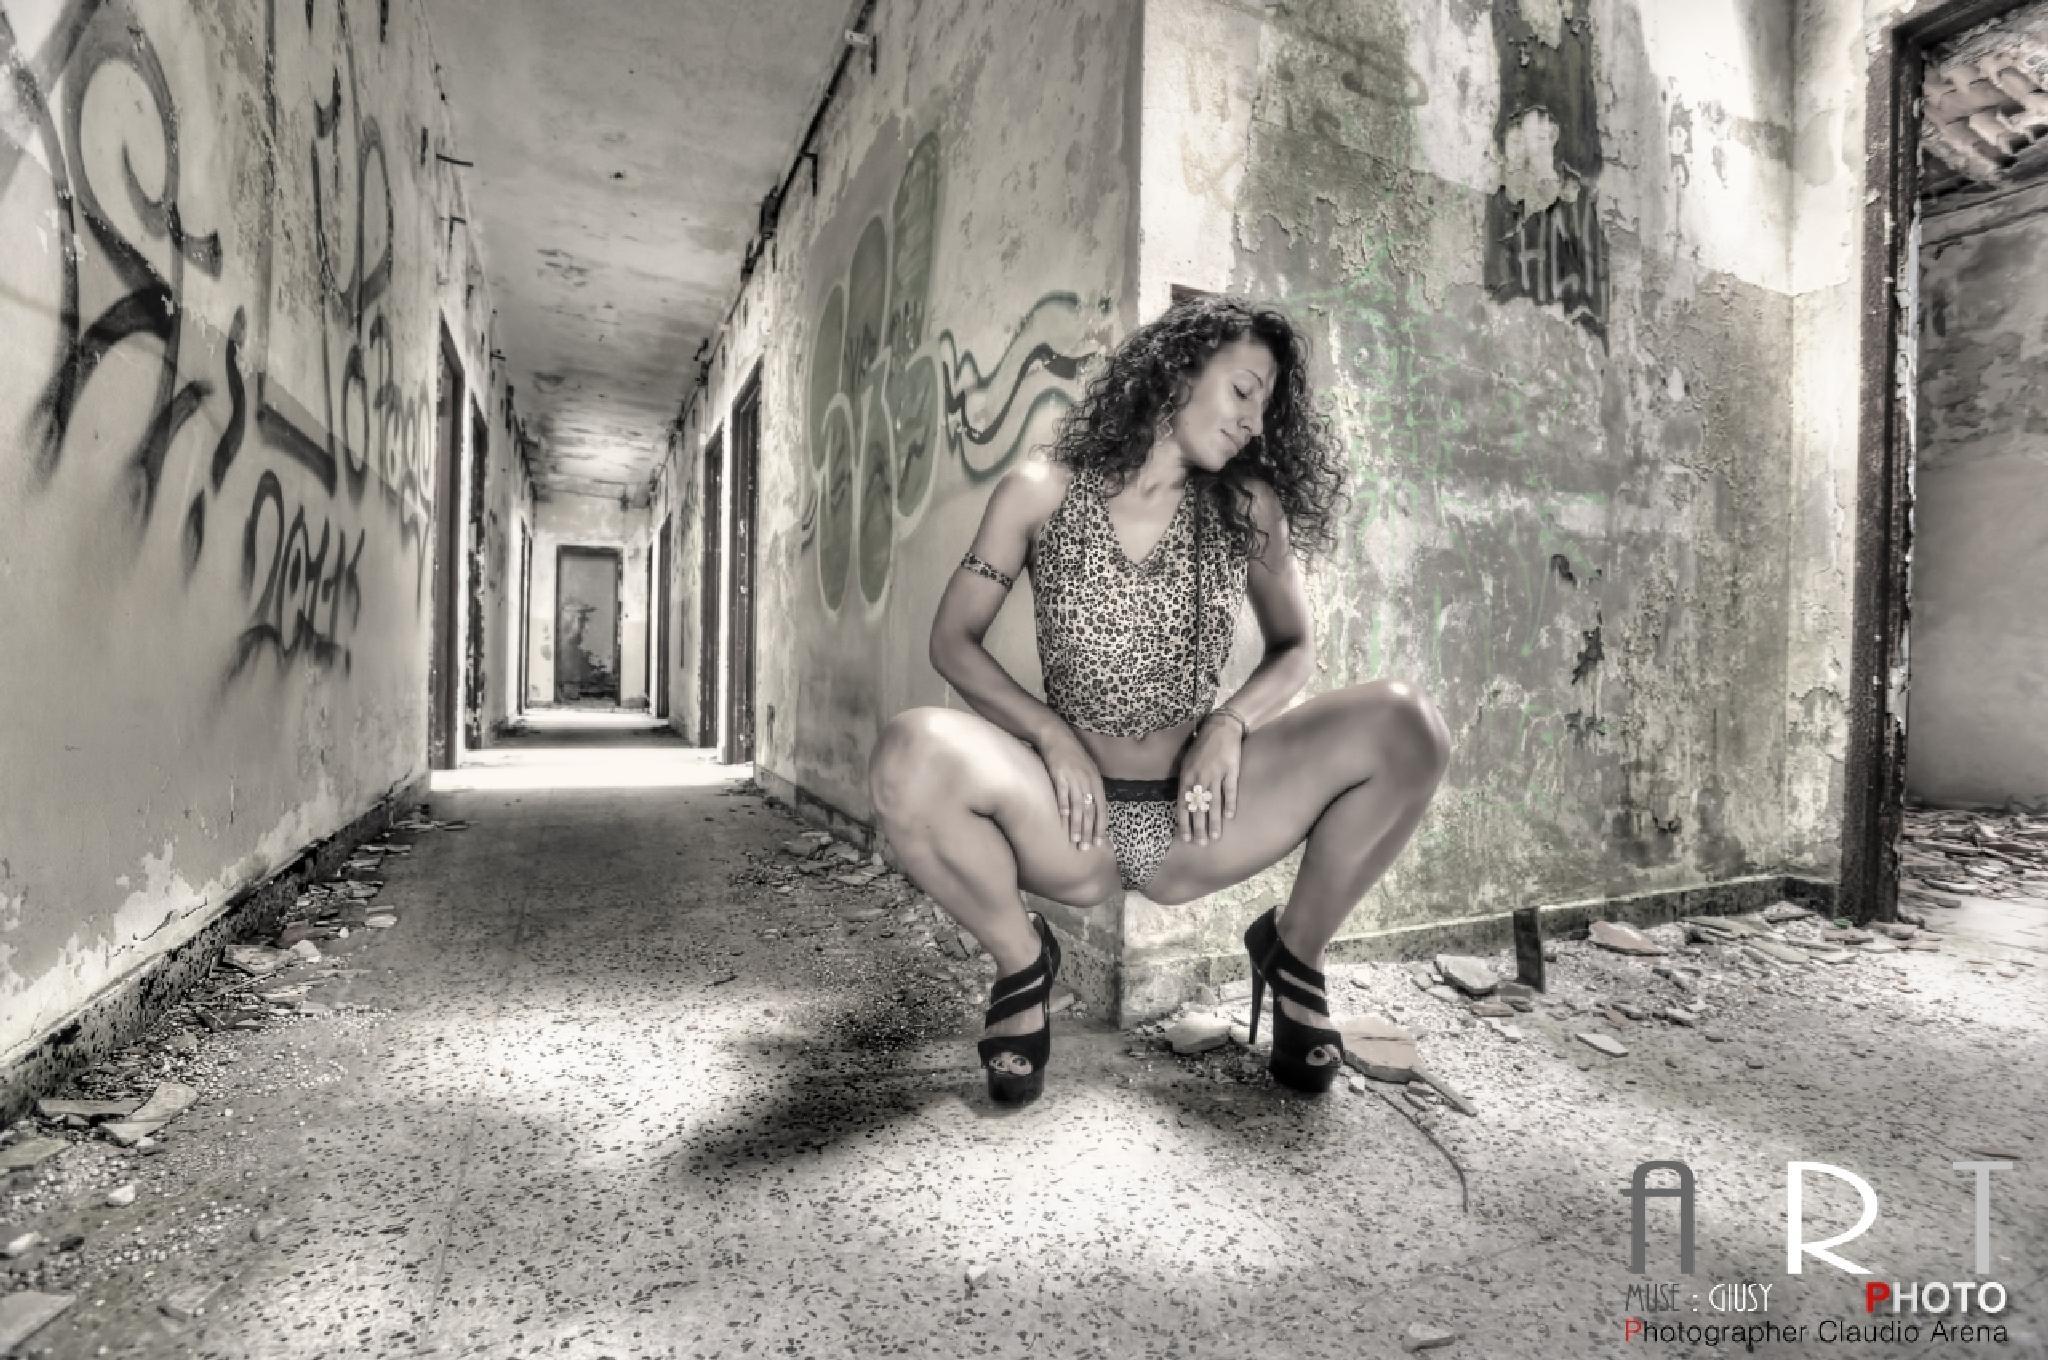 ARTE by fotoclaudioarena